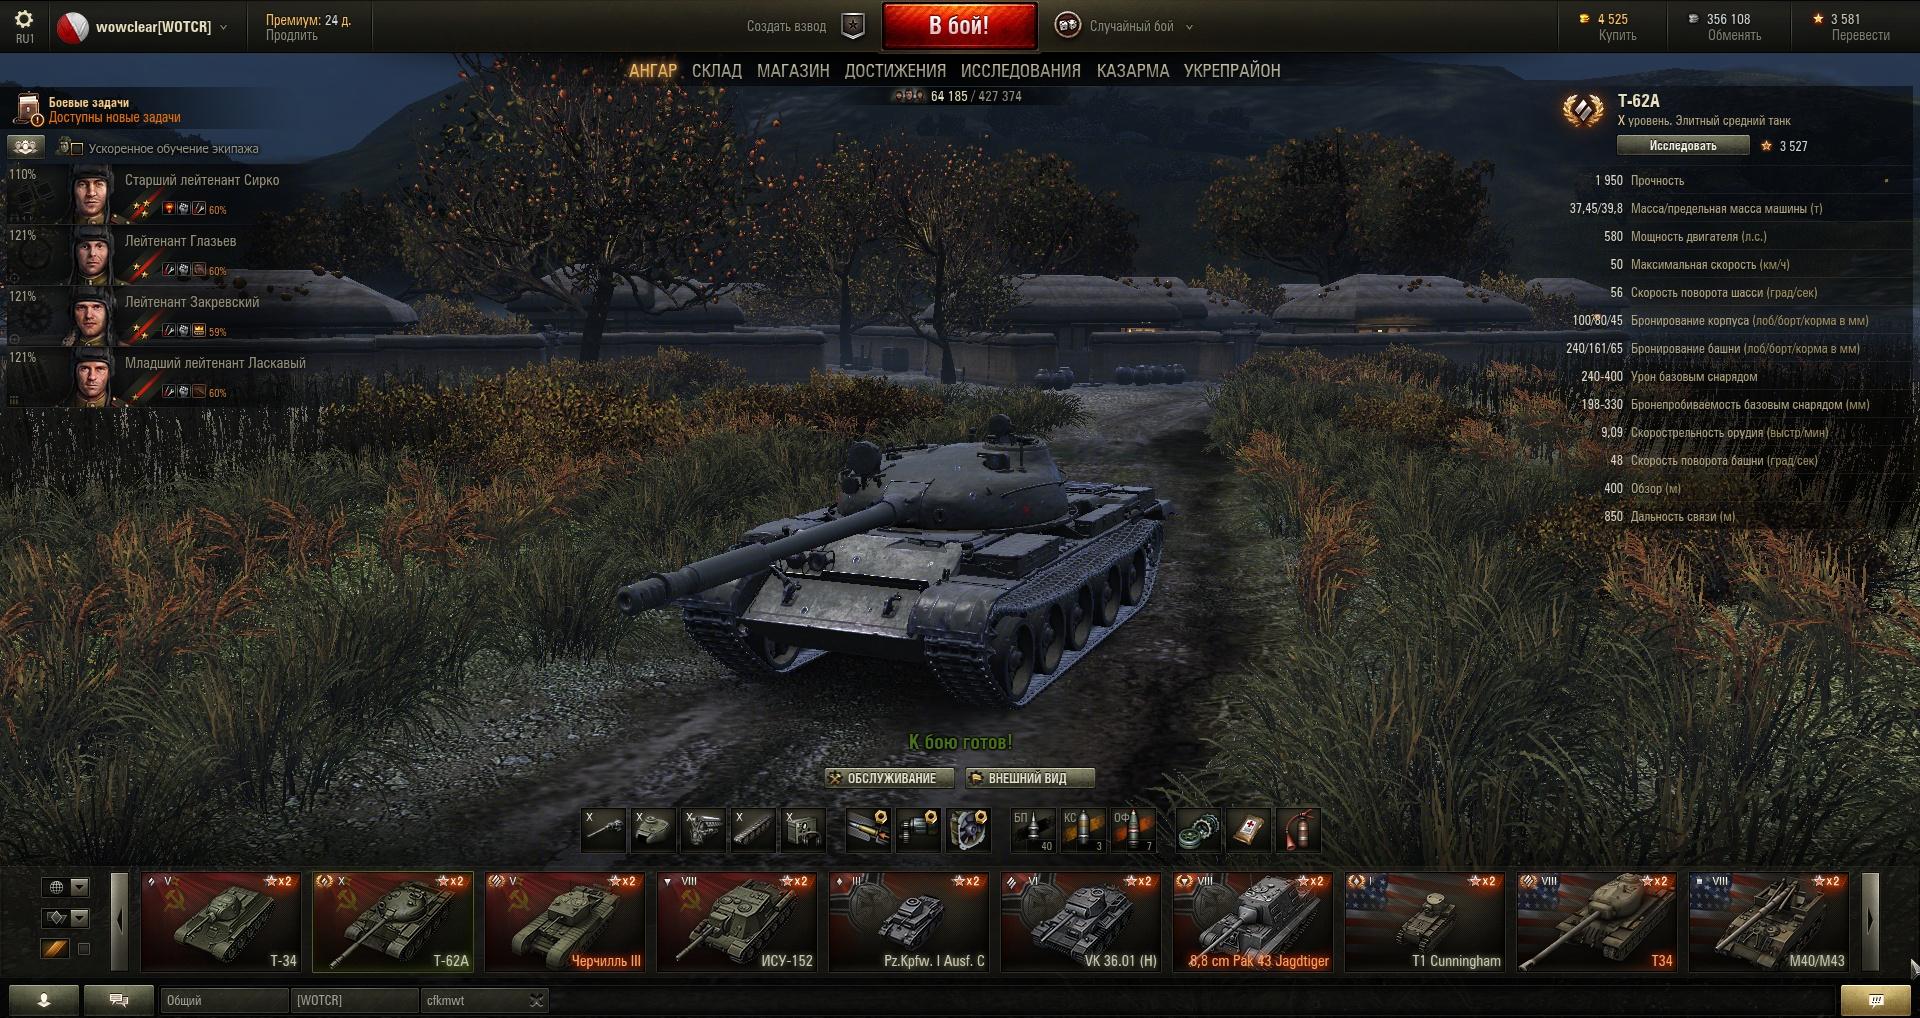 Скачать мод xvm оленемер для world of tanks 1. 4. 0. 0.